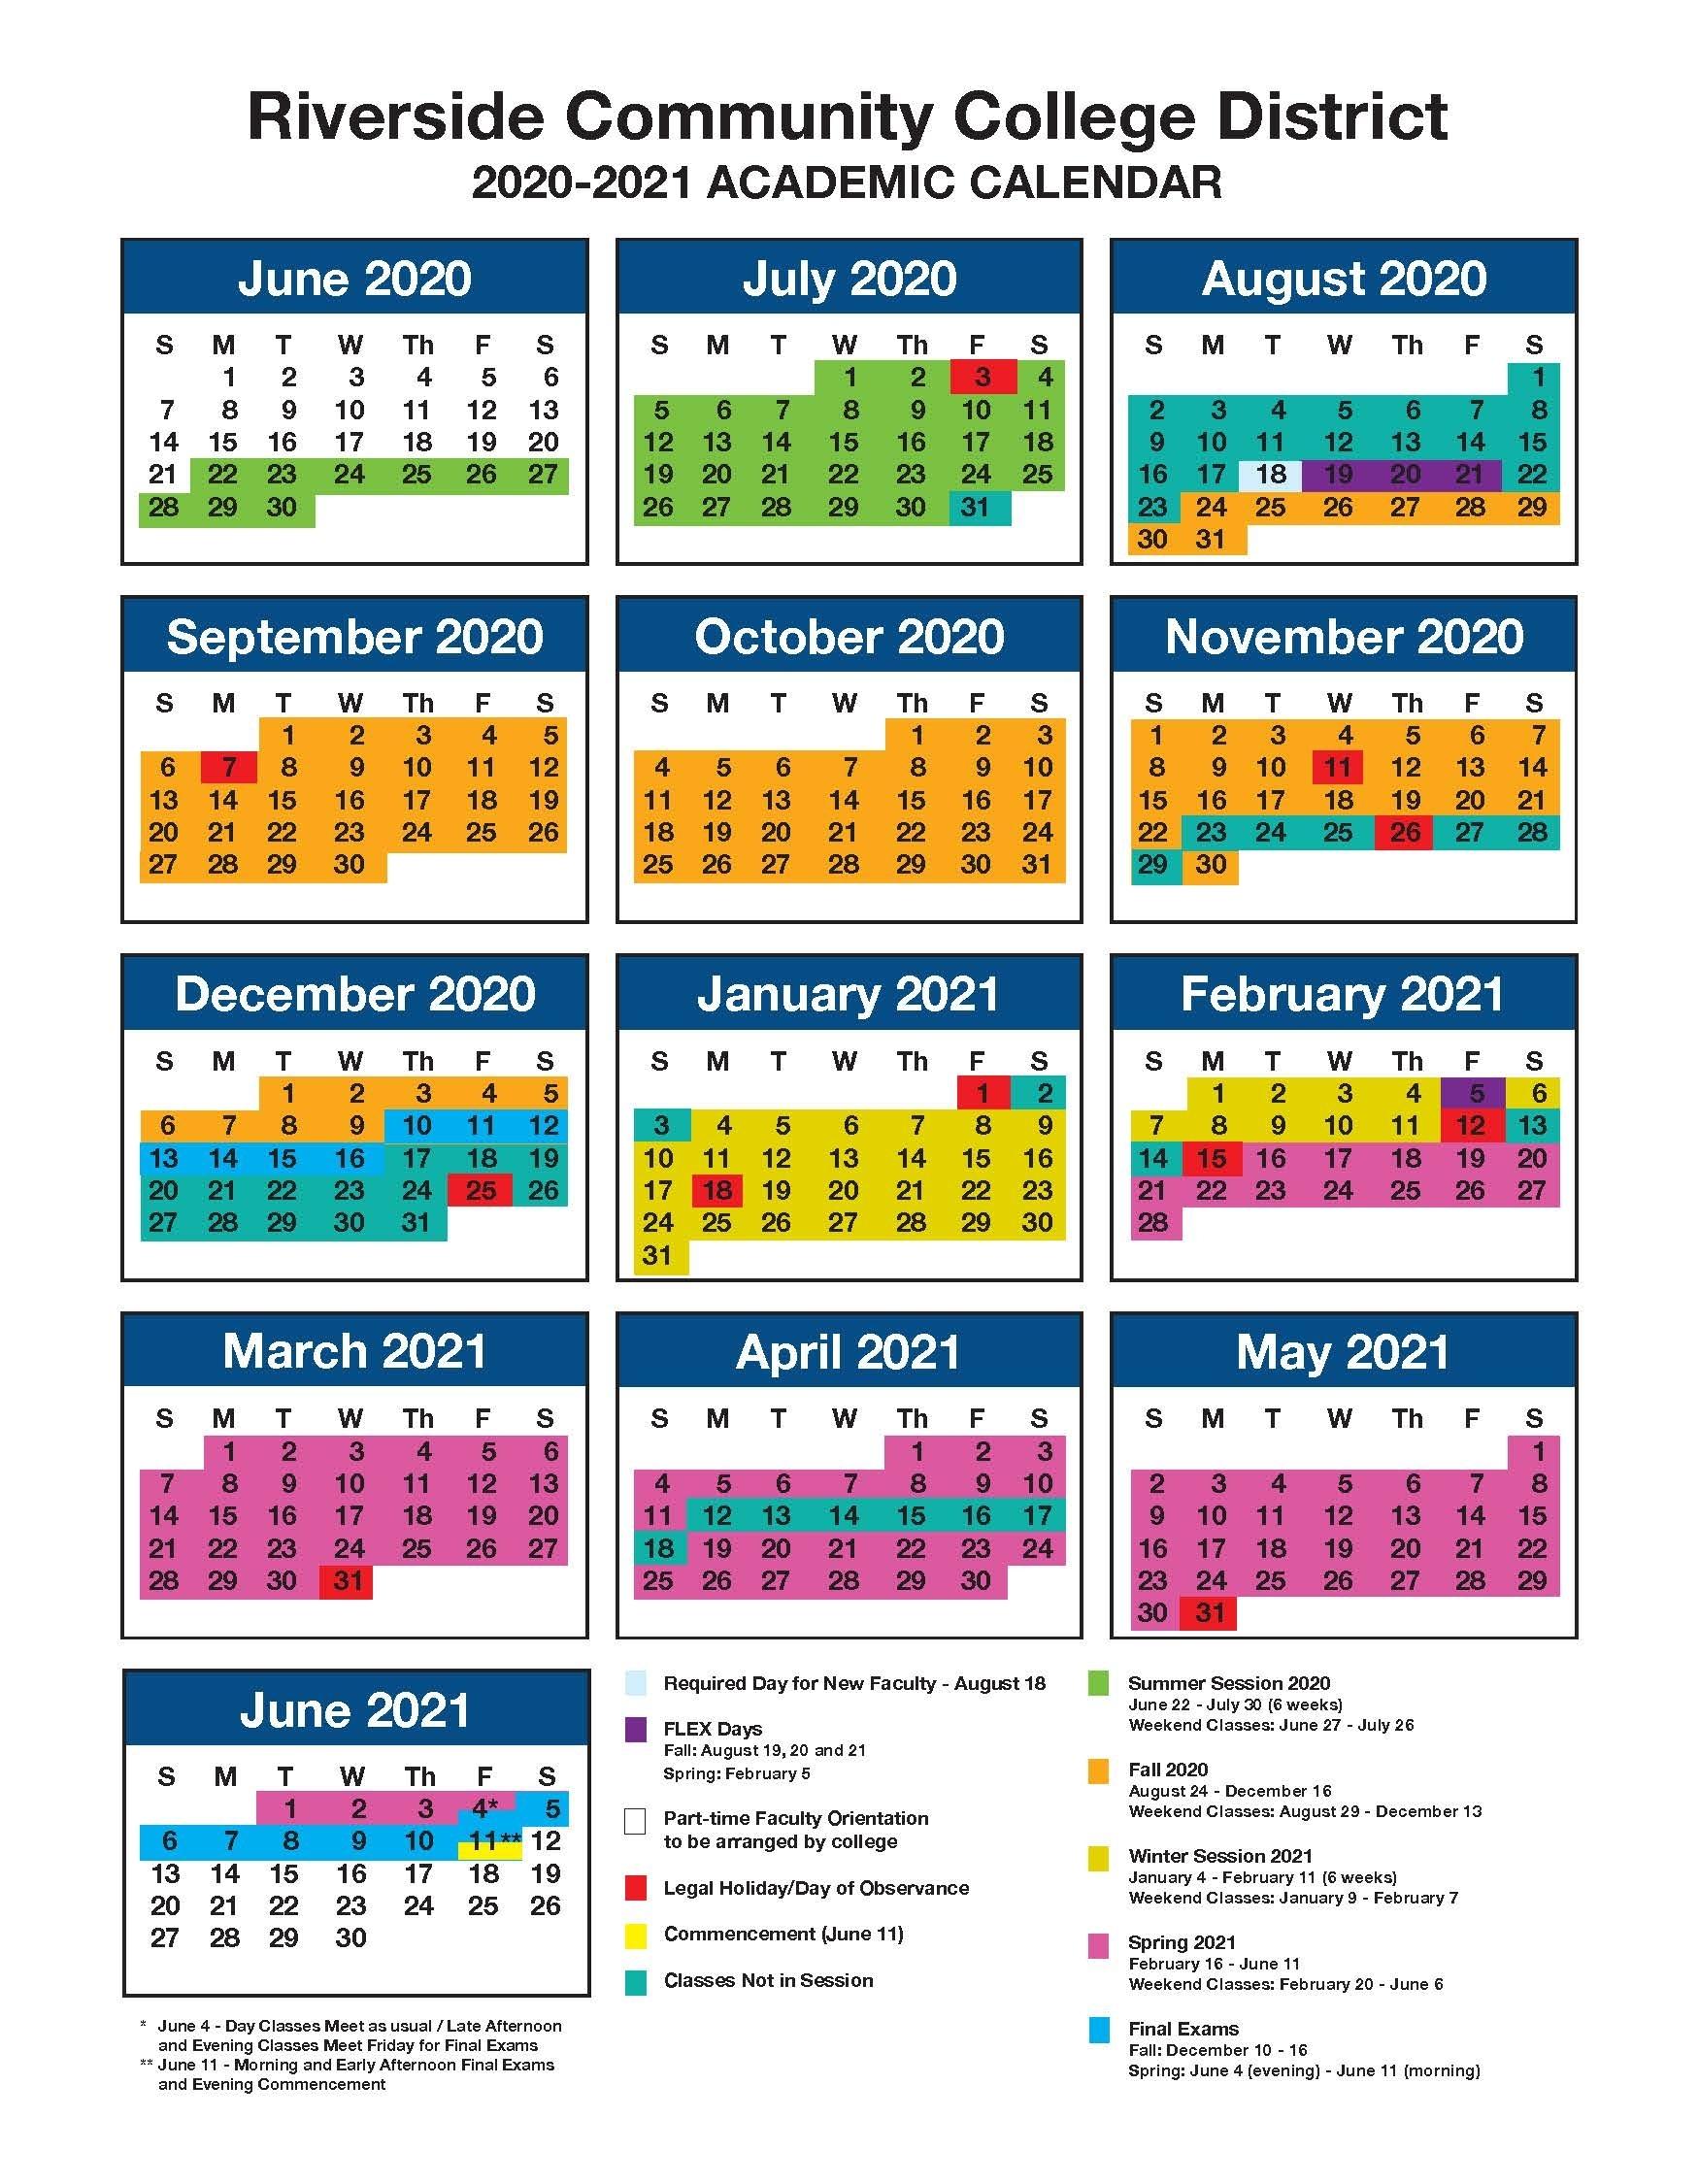 Csulb 2021 Calendar